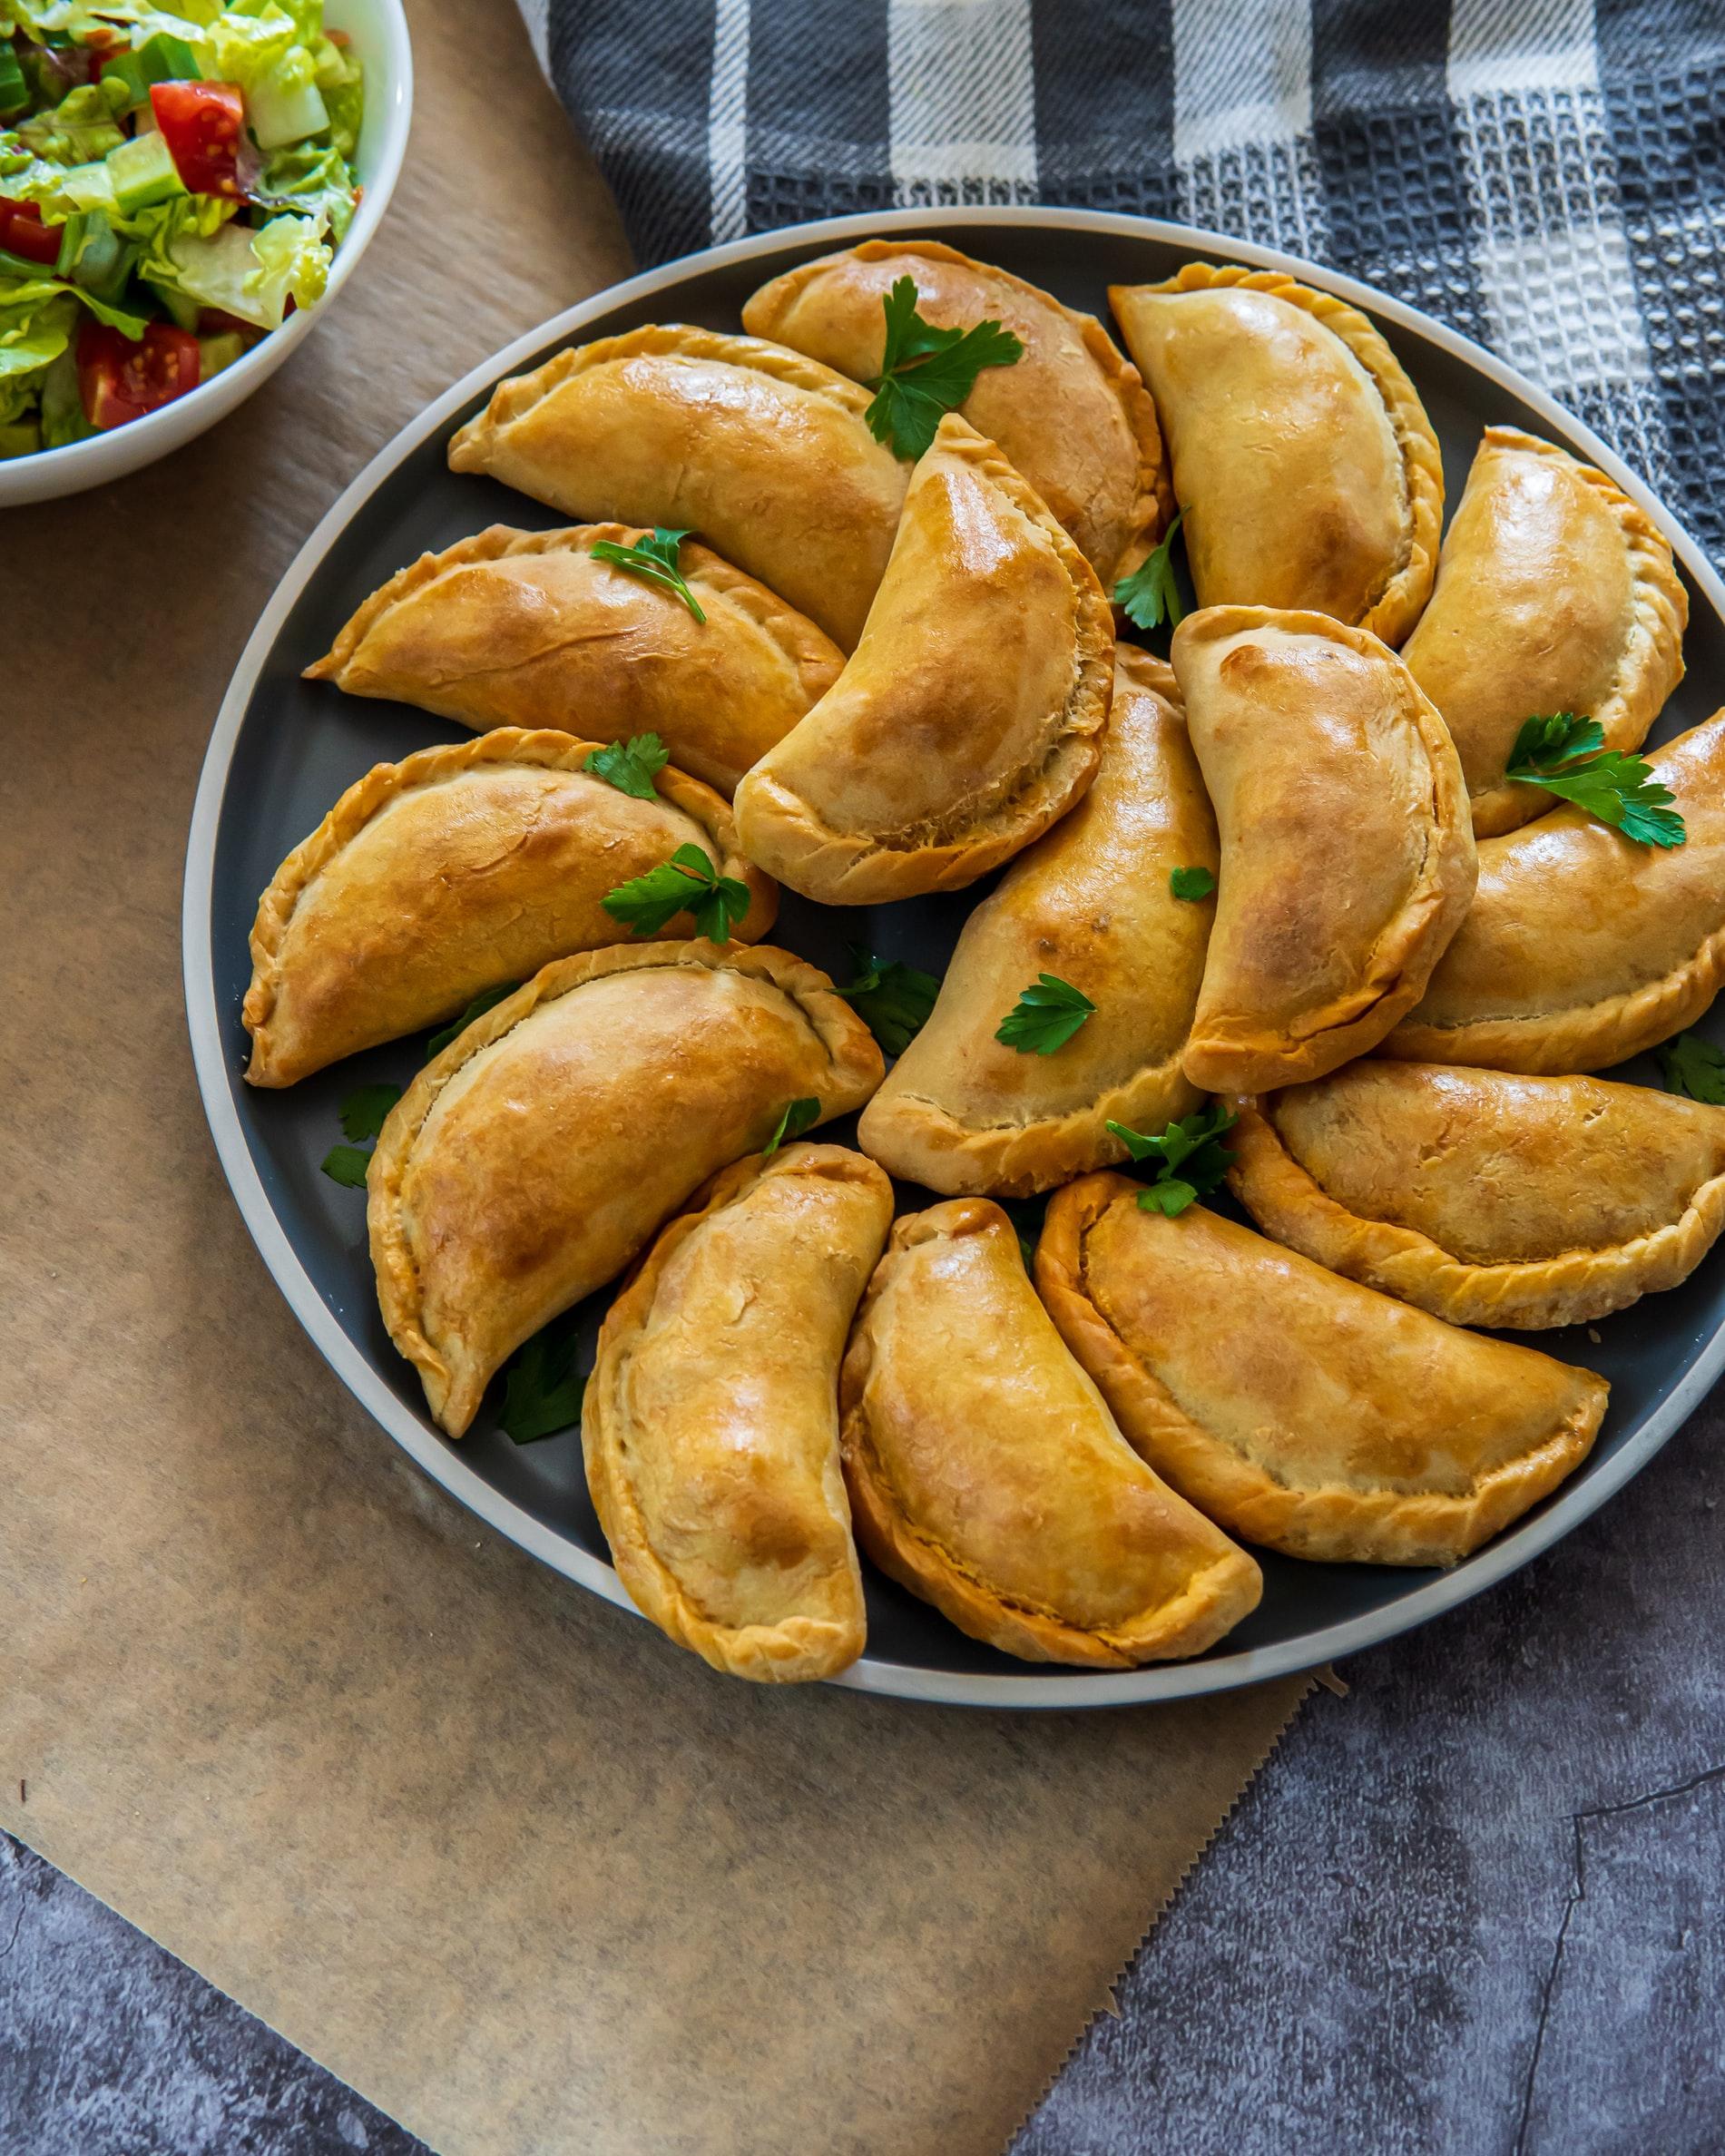 Empanada, Spanish Food, spanish cuisine, traditional spanish food, food in Spain, Spanish dishes